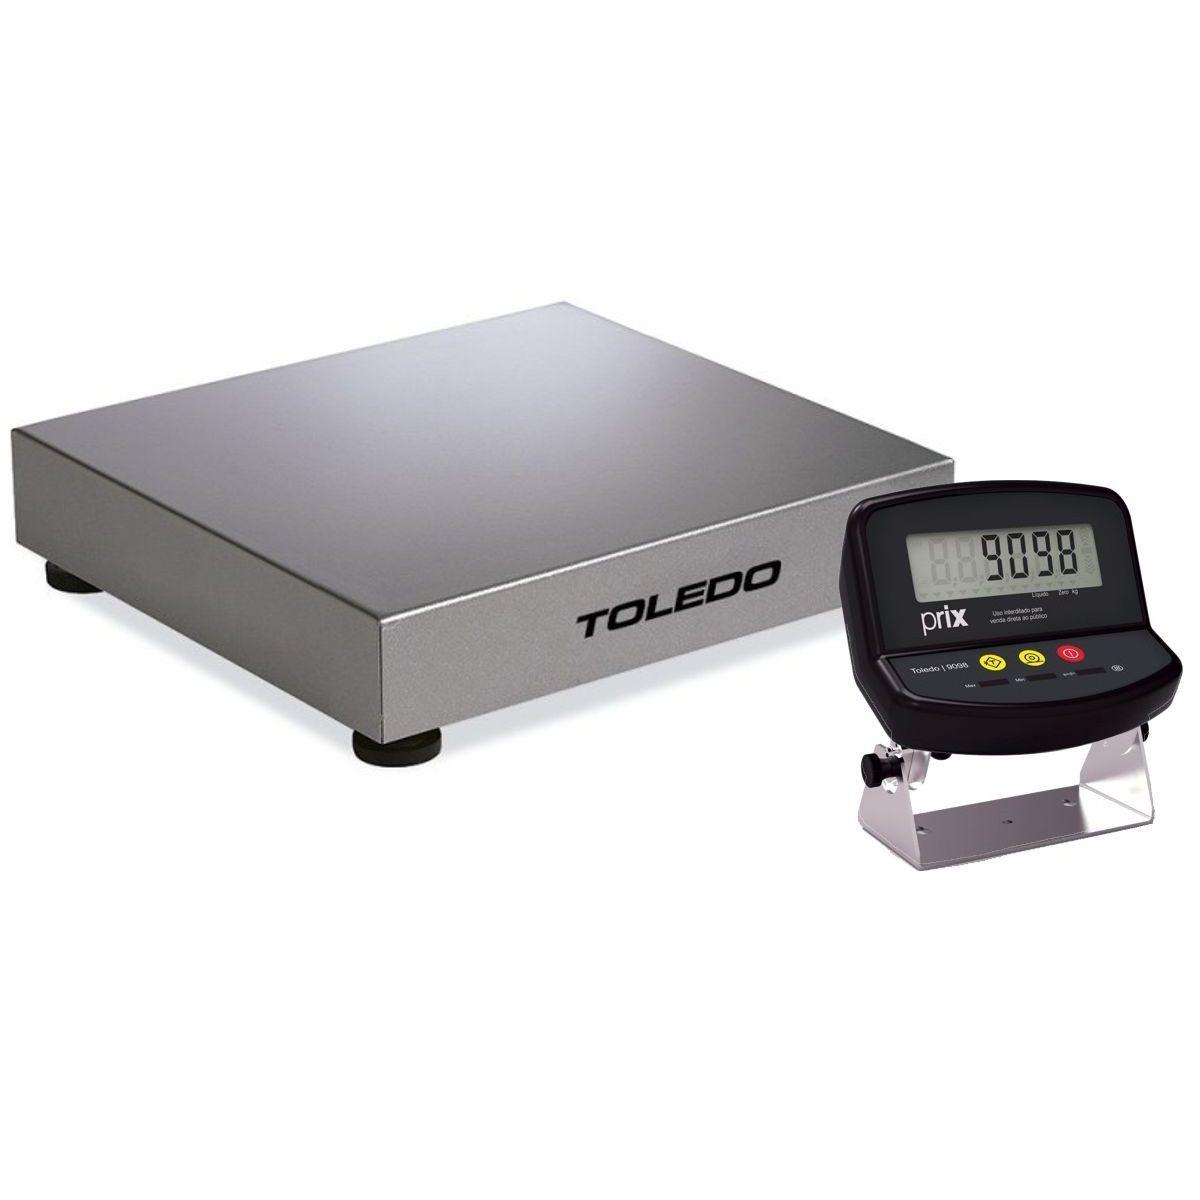 Balança de Plataforma Toledo 2098 (30Kgx5g) (37,5x42,5cm)